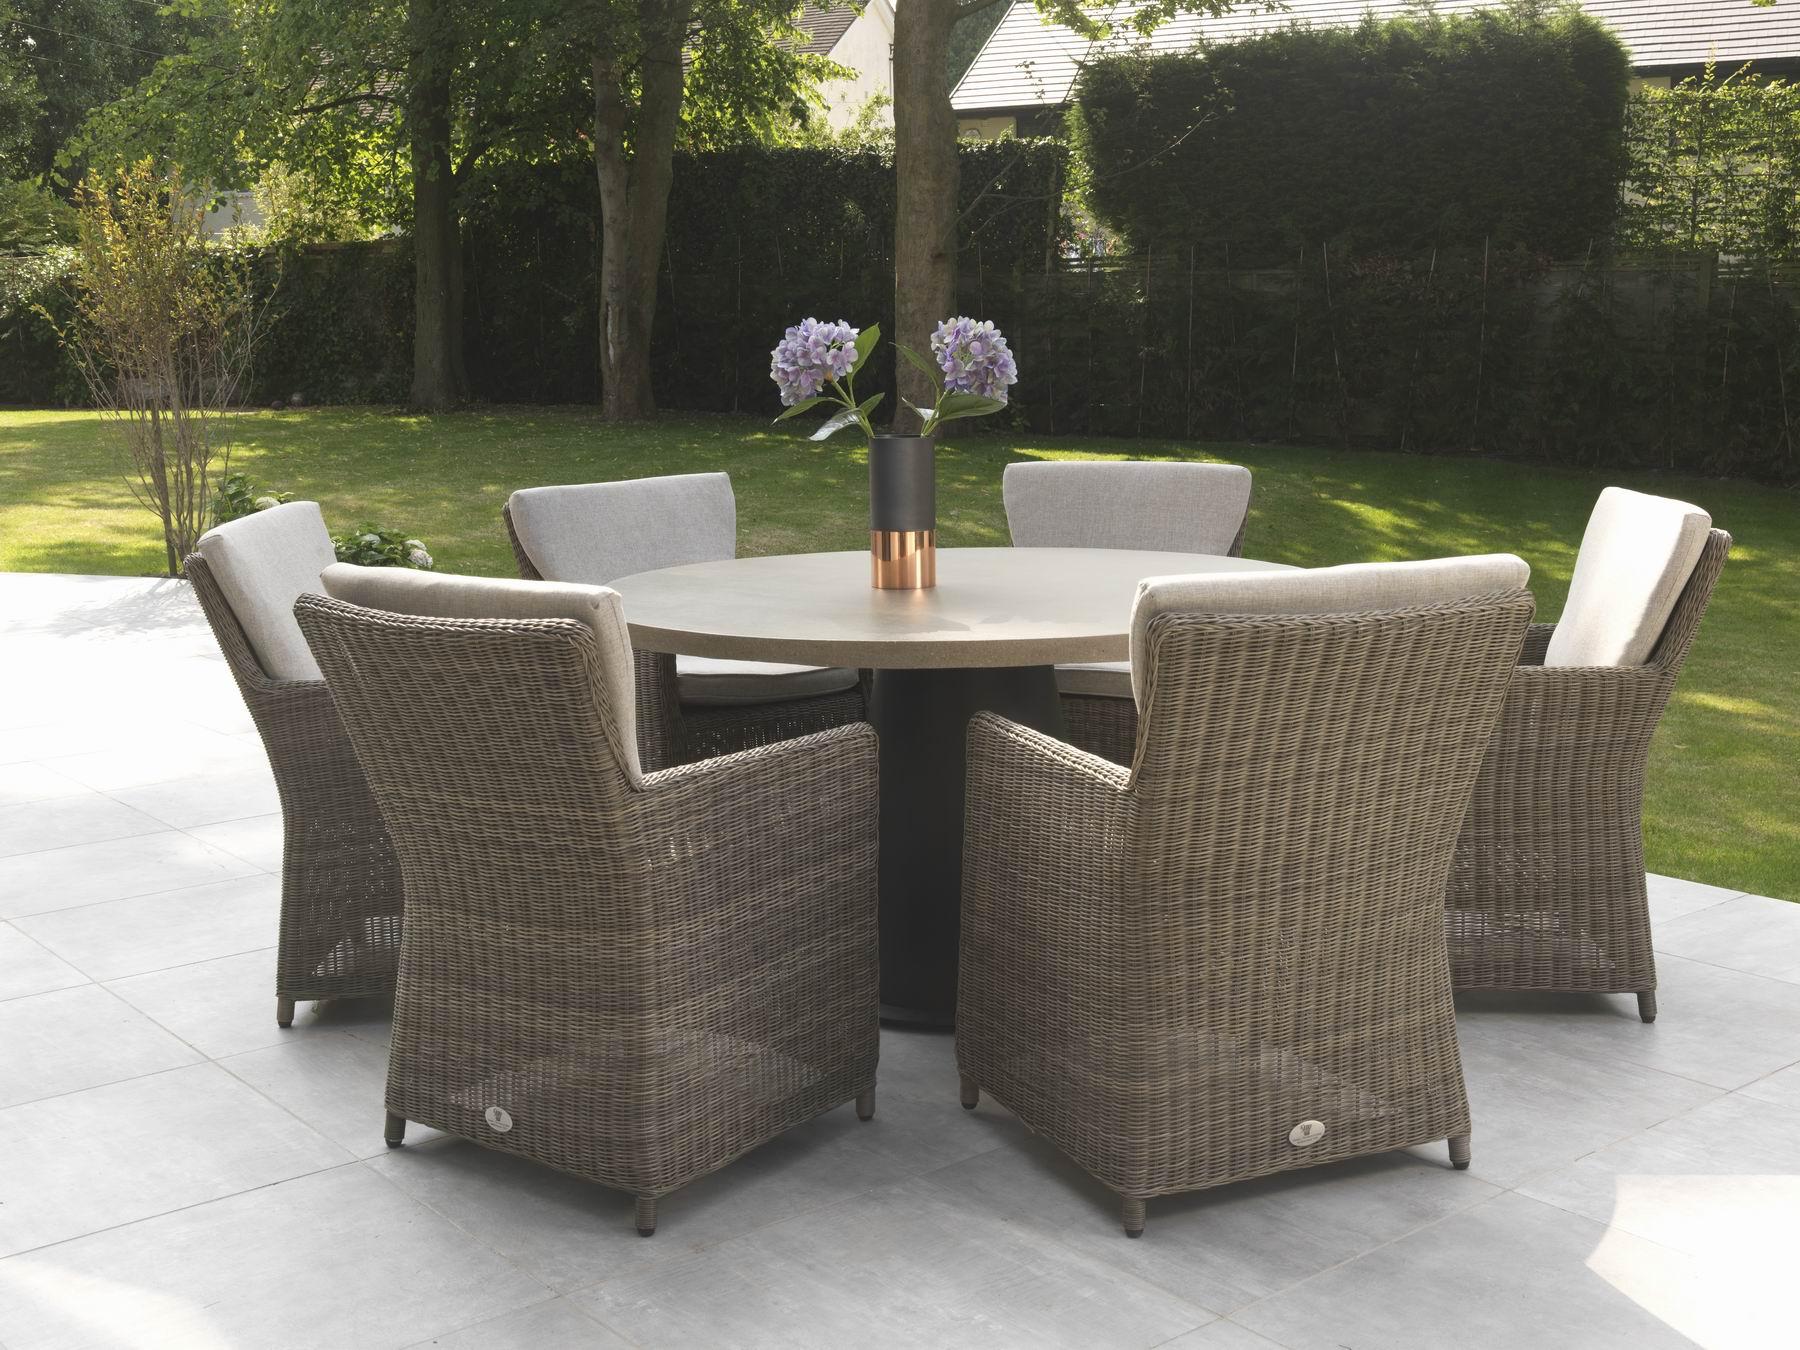 wicker garden furniture rimini 6 seater rattan garden furniture range ZAIPJVJ